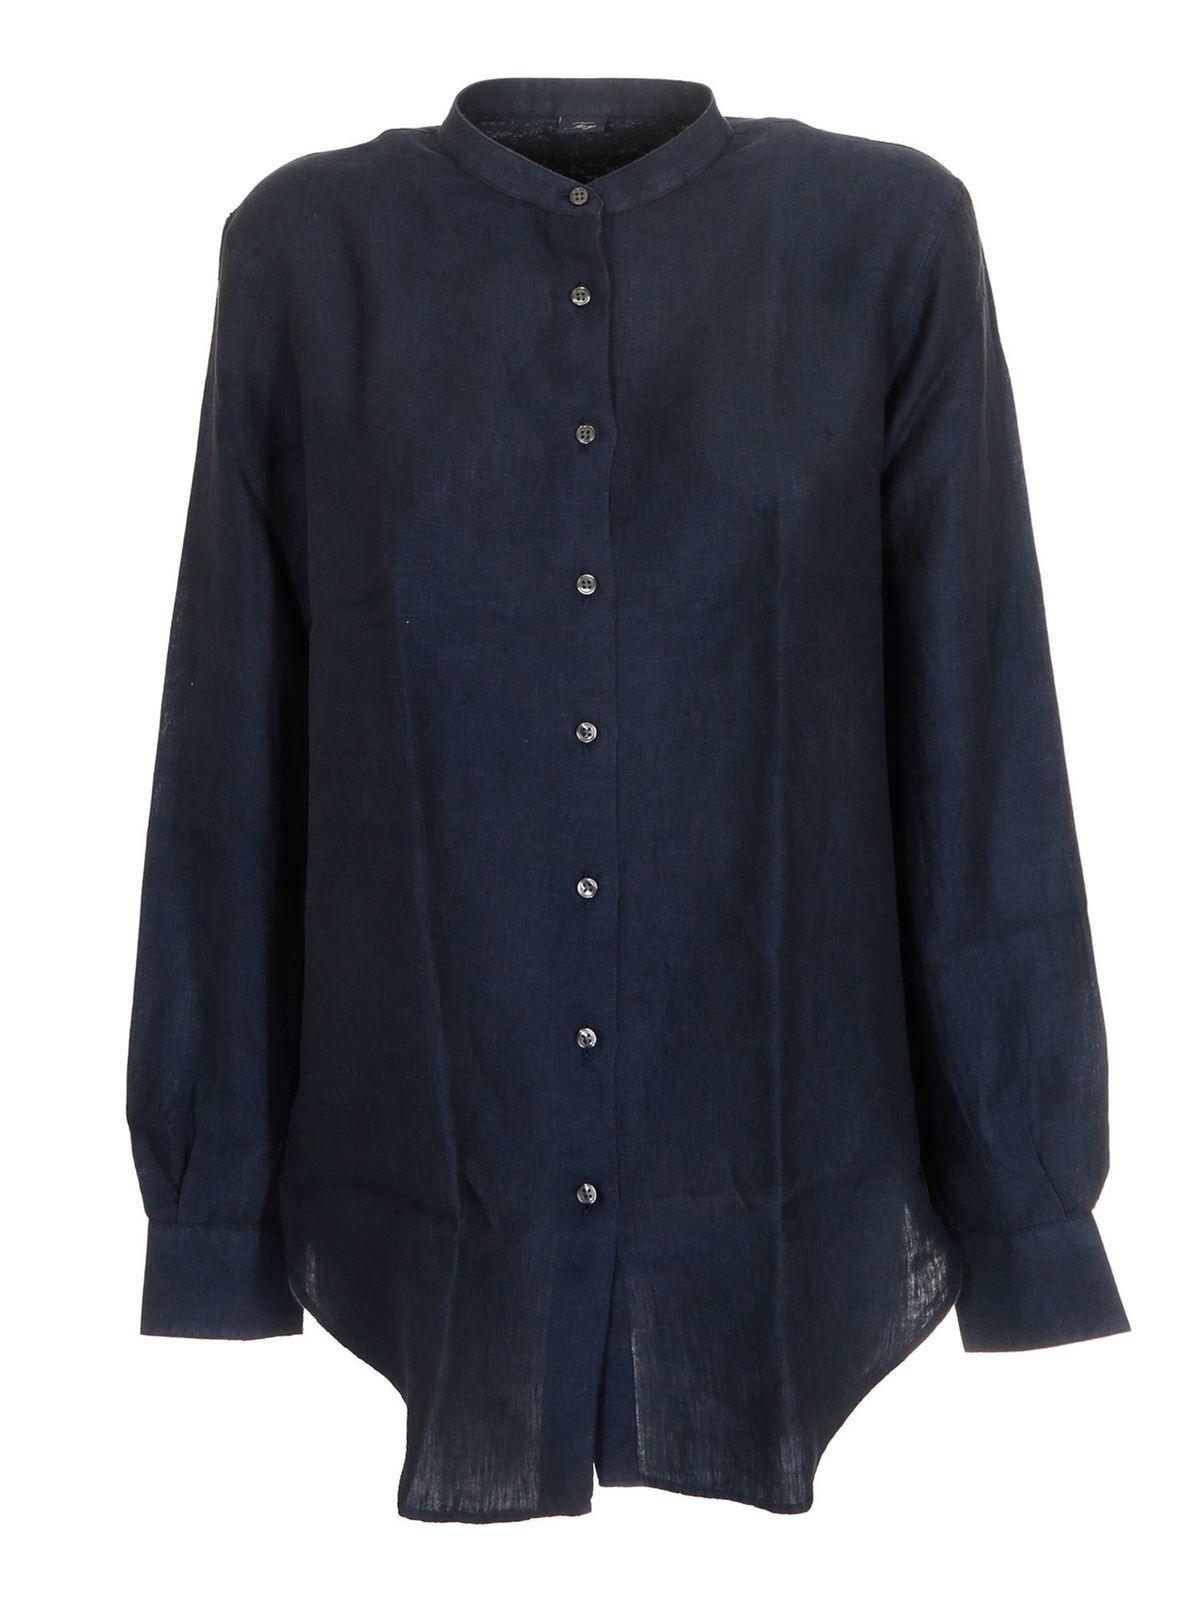 Fay Linens MANDARIN COLLAR SHIRT IN BLUE